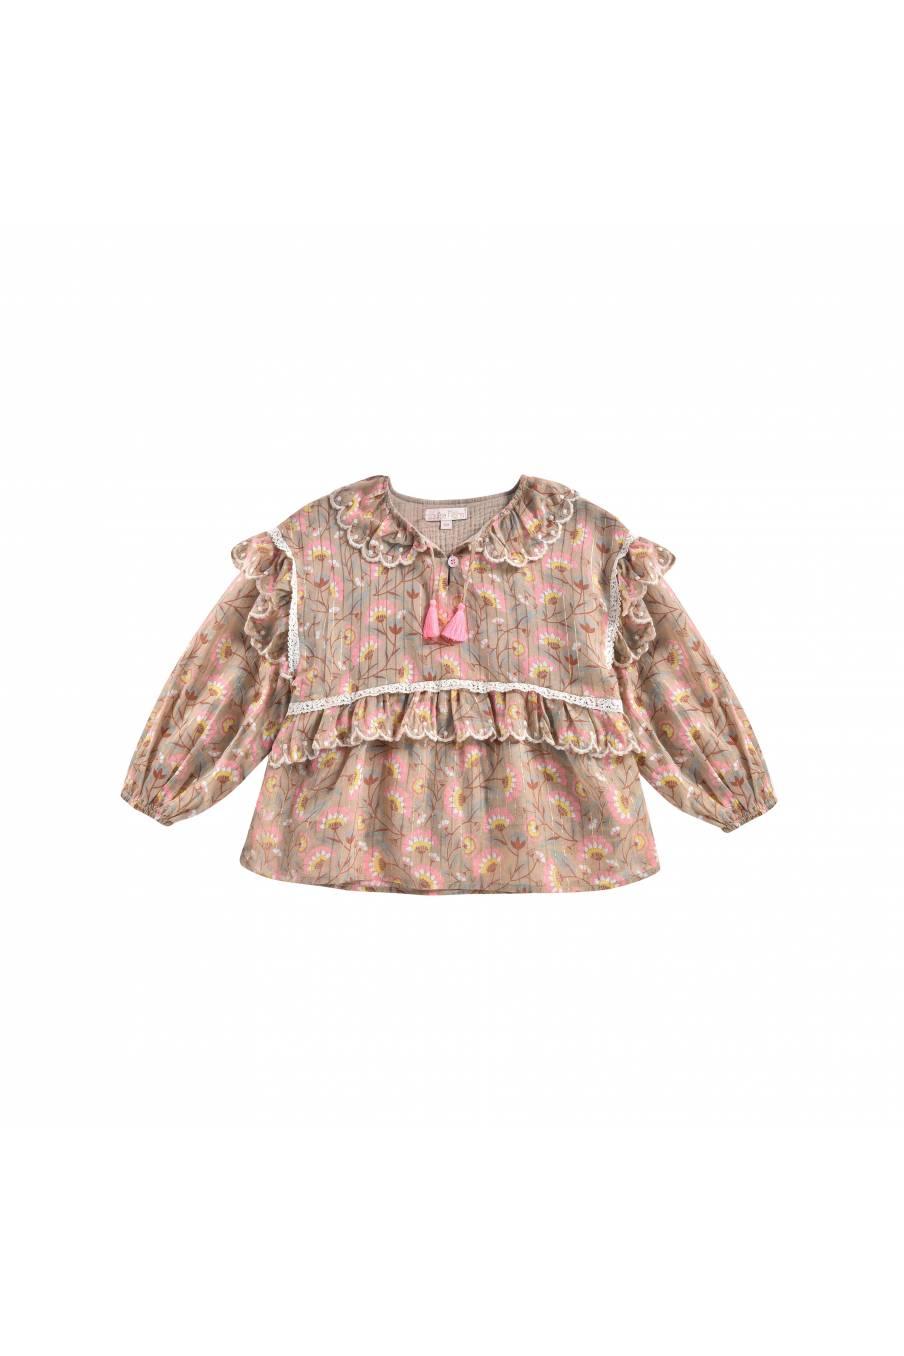 boheme chic vintage blouse bébé fille gaita khaki folk flowers